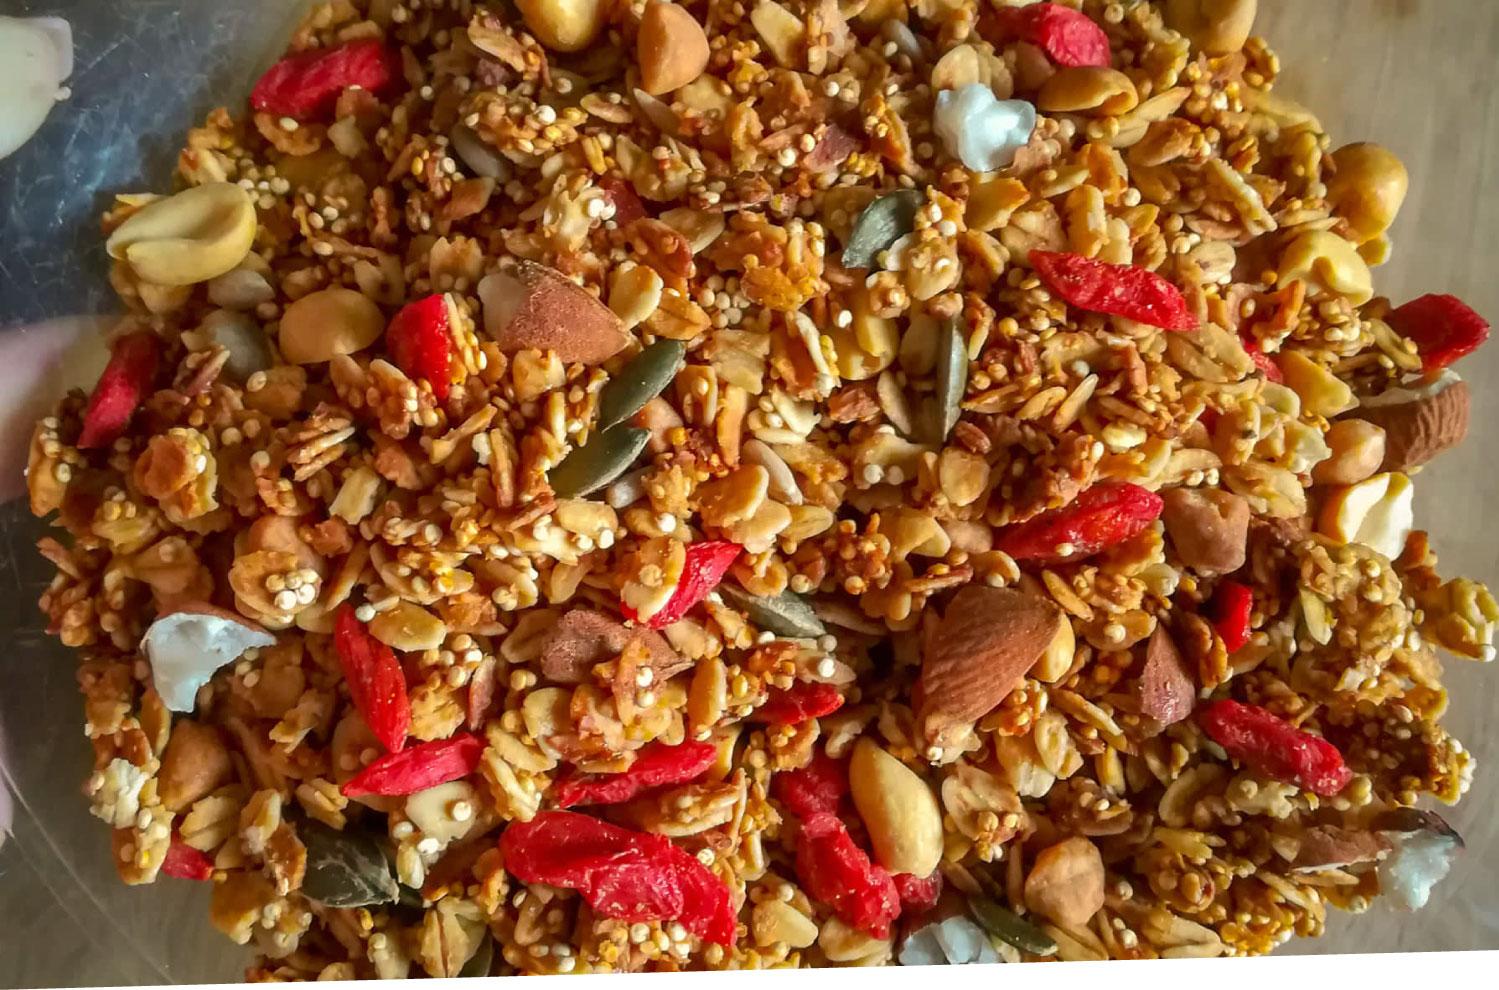 ramona-debono-Crunchy-Quinoa-Granola-mix